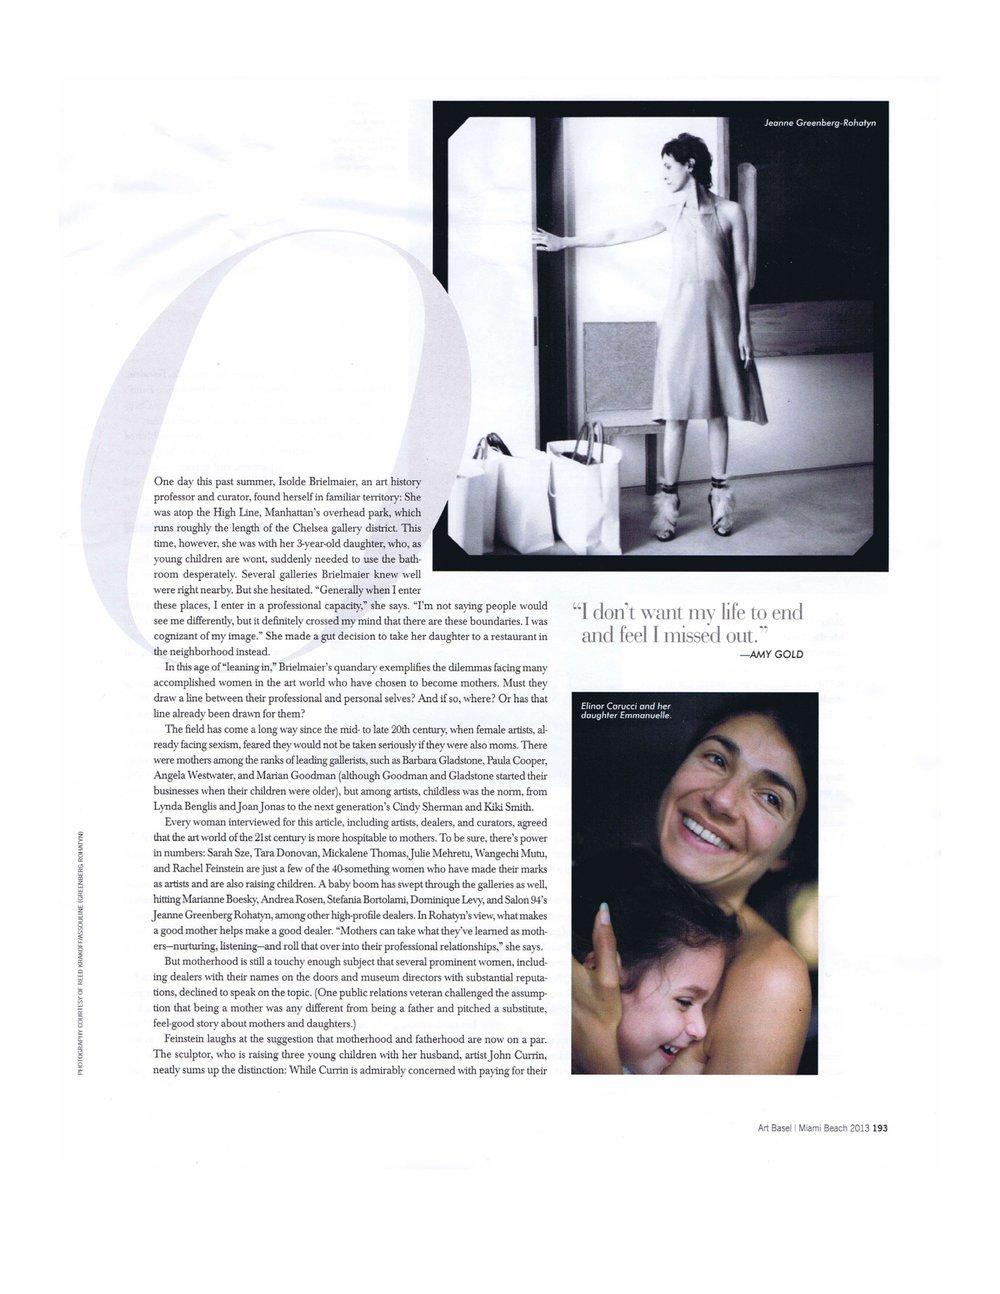 ABMB magazine_Yvonne_December 2013 2.jpeg